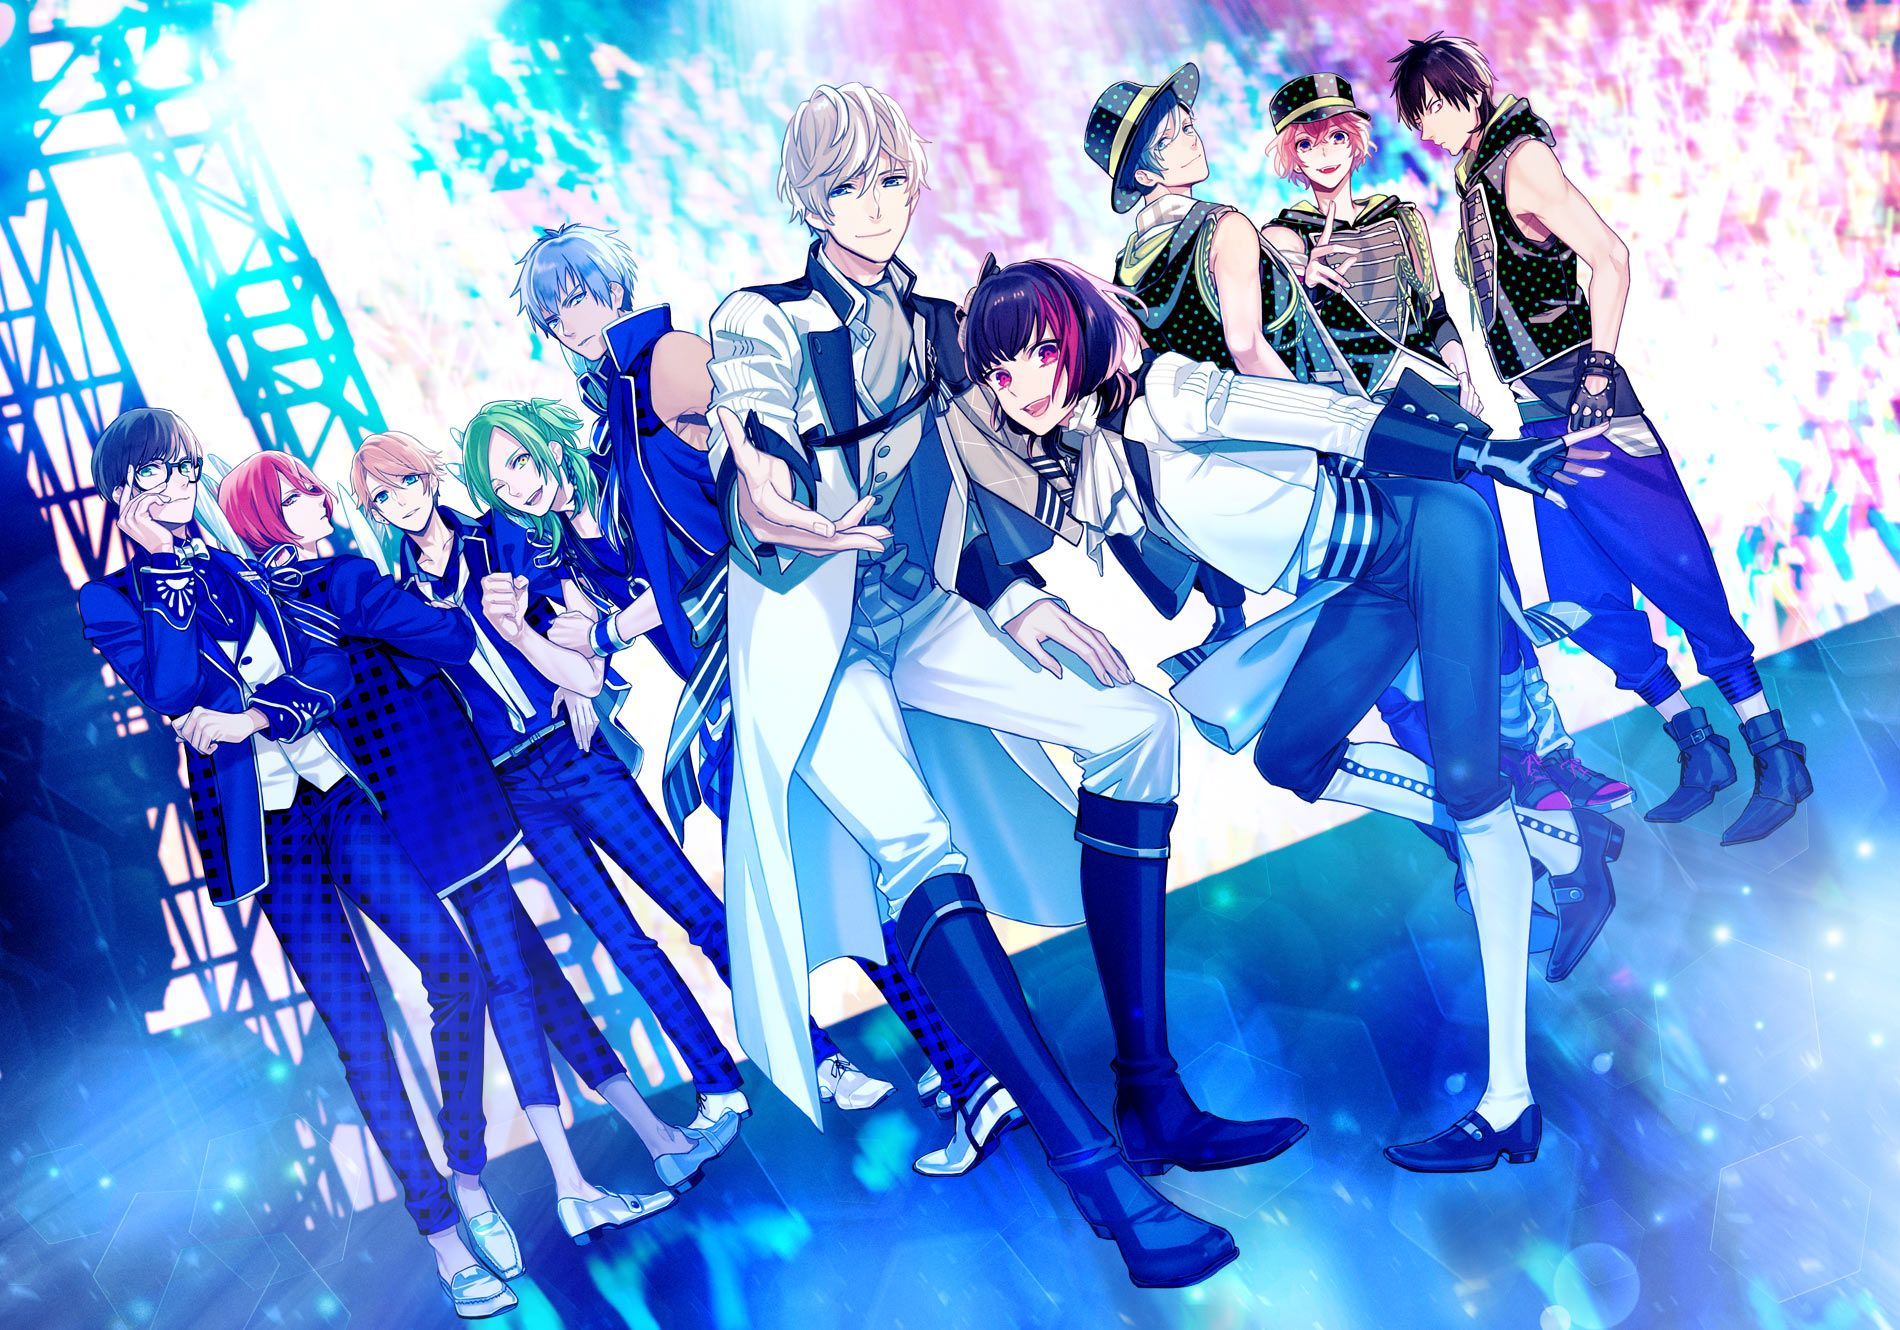 BPro Anime Announcement TVアニメ「BPROJECT~鼓動*アンビシャス~」公式サイト